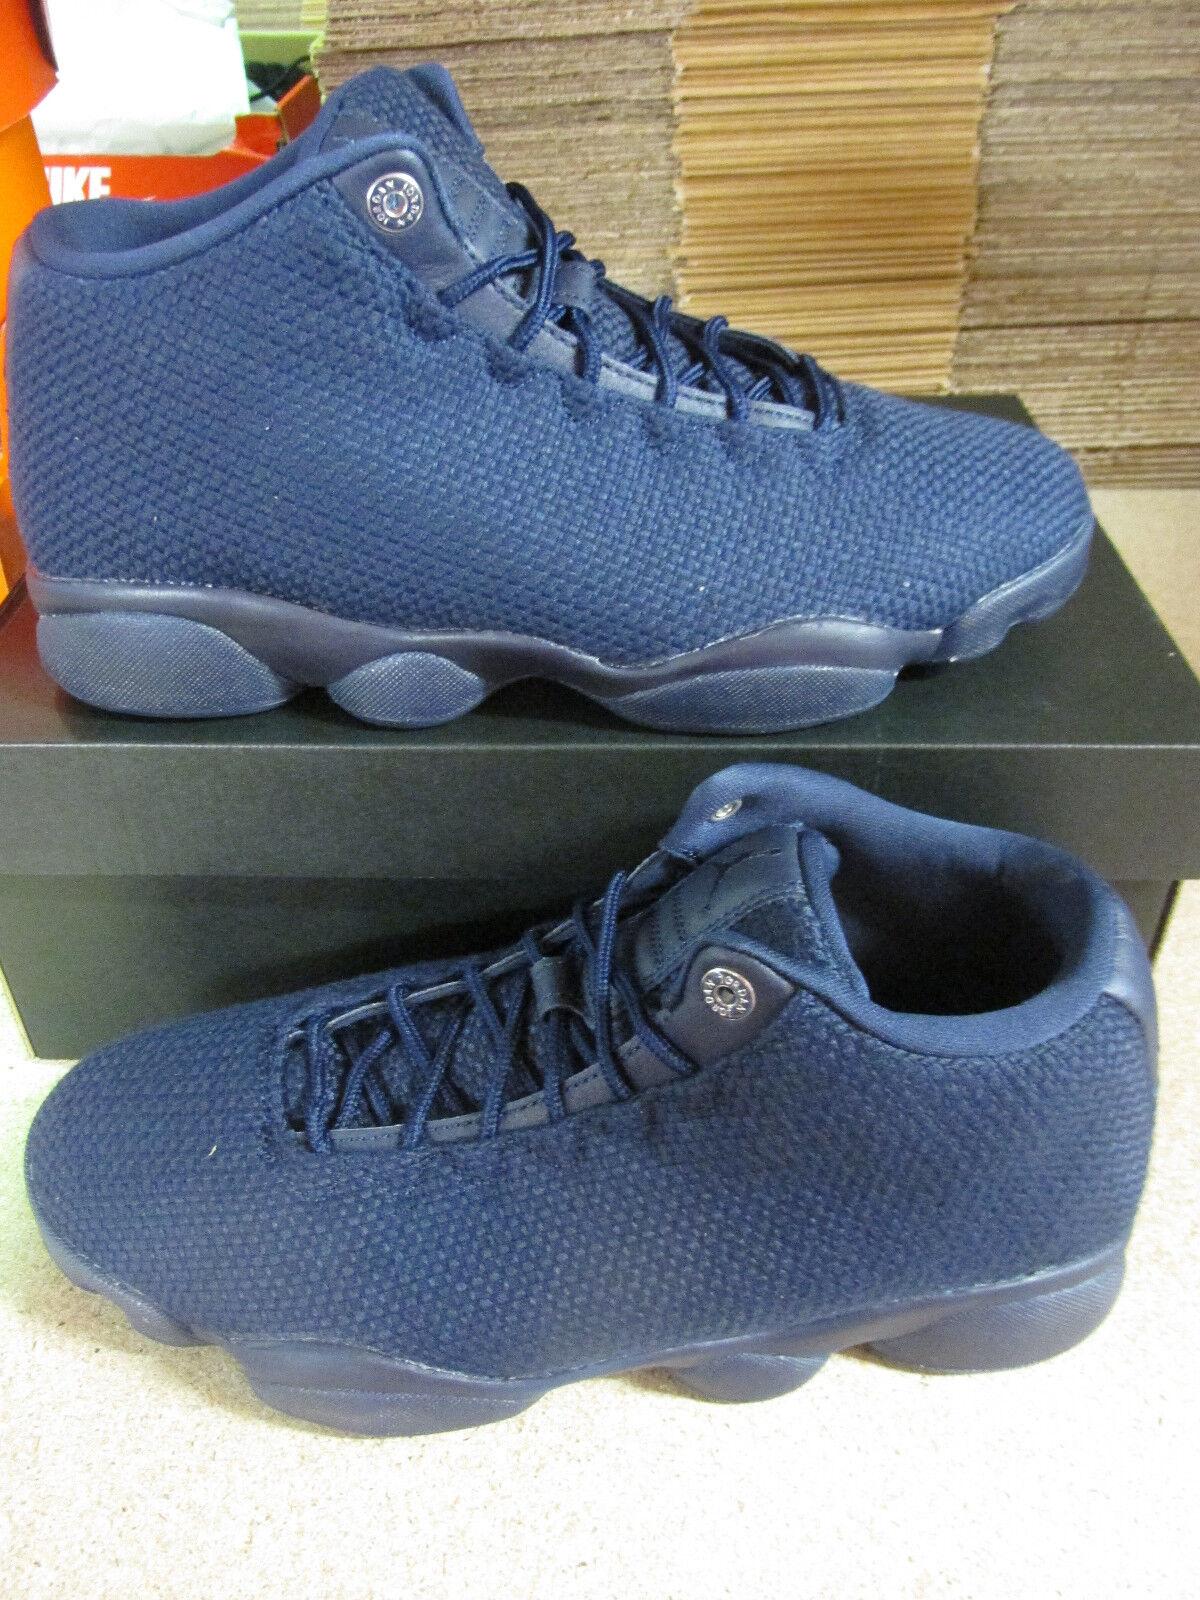 Nike air jordan orizzonte basse - scarpe ginnastica pallacanestro 845098 400 da